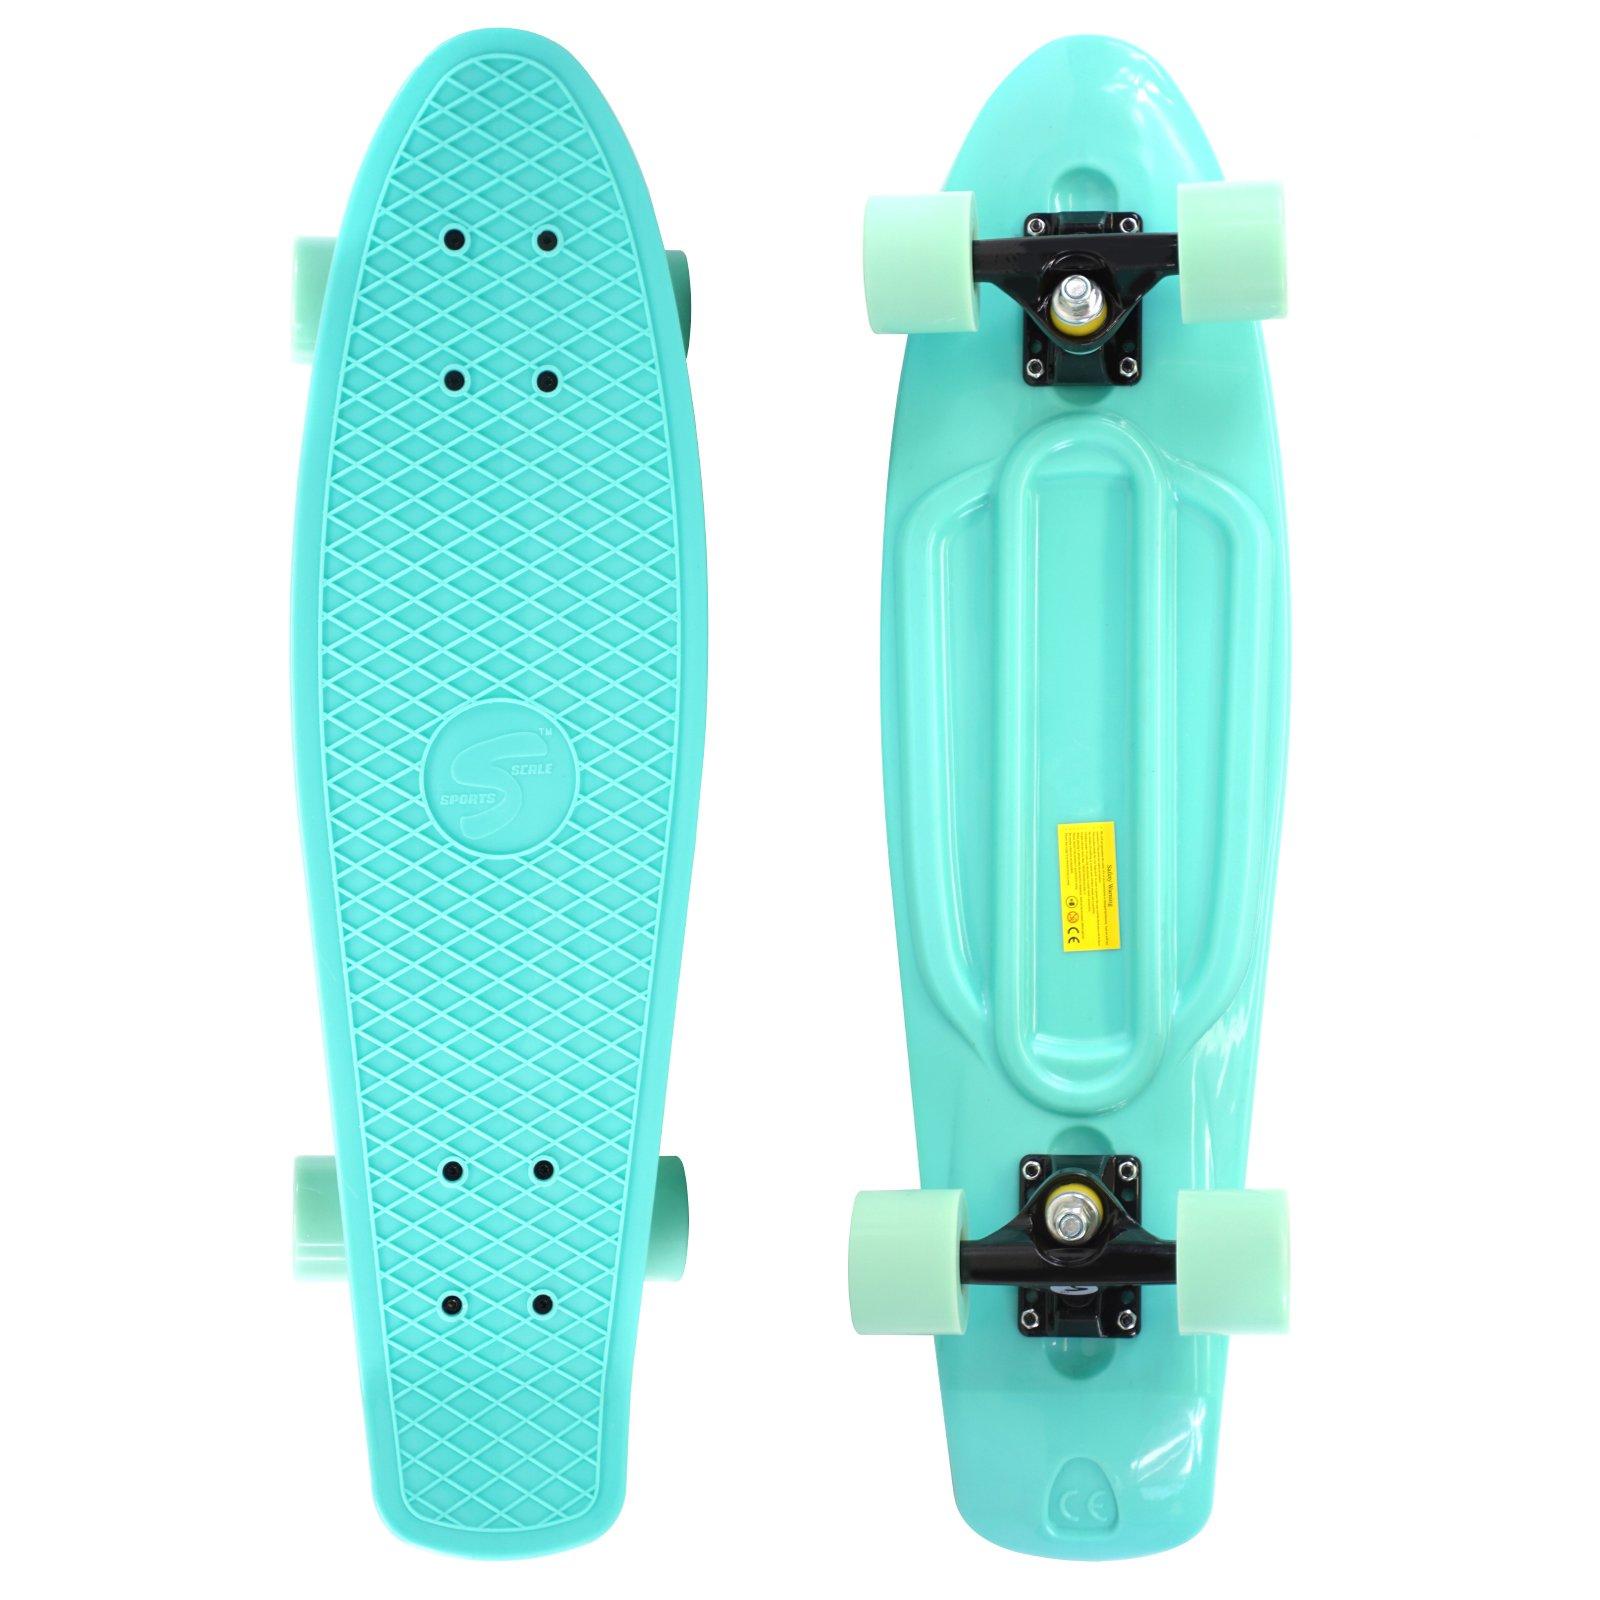 Scale Sports 27'' Skateboard Complete Pastel Street Retro Cruiser Classic Plastic Deck Mint